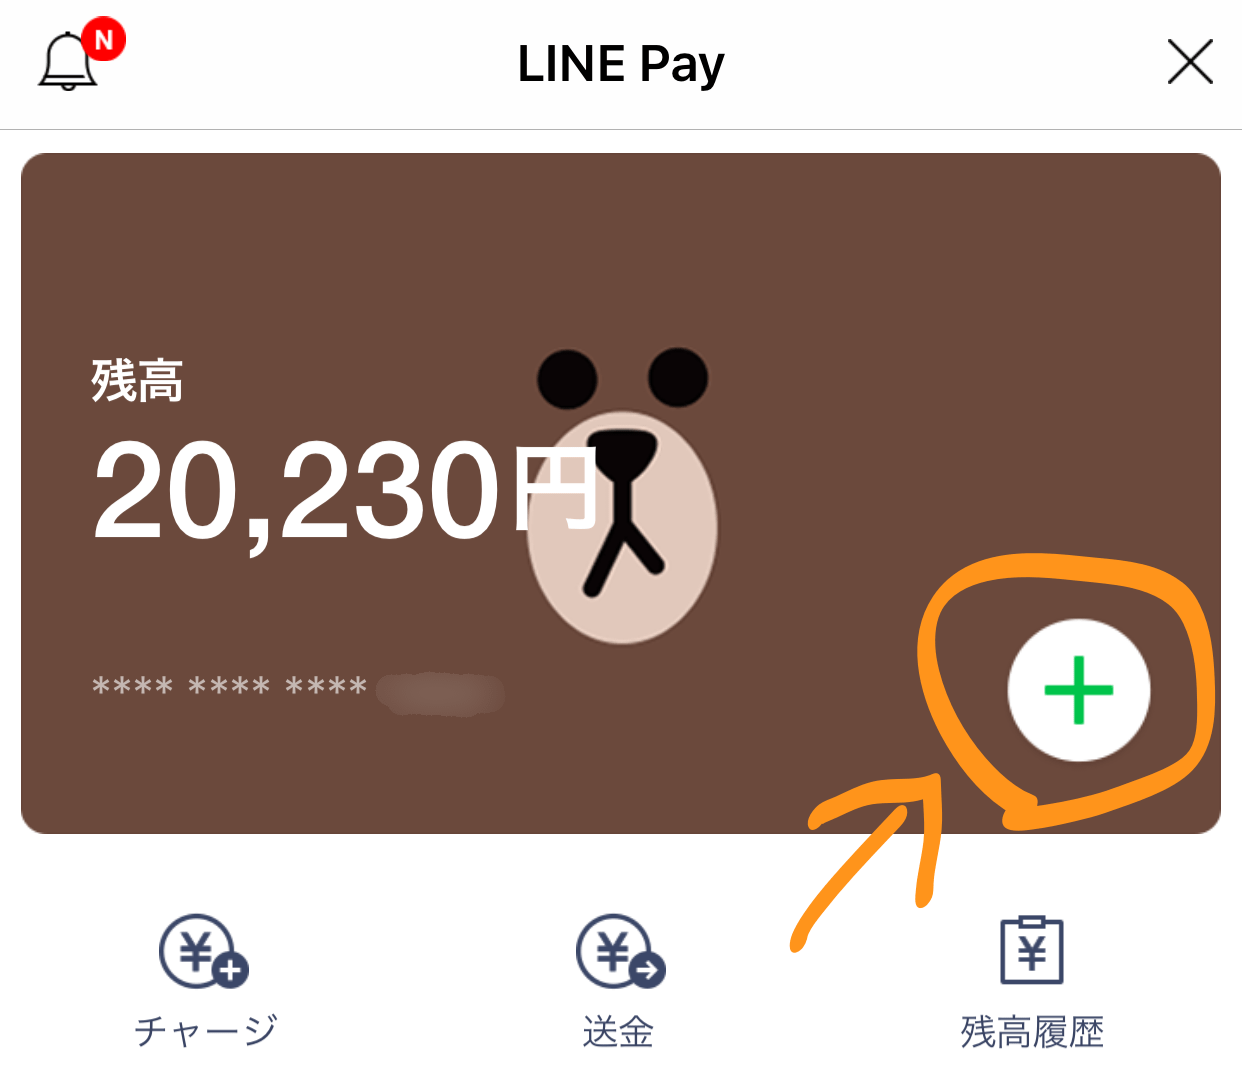 LINEPay 7Ginko 03